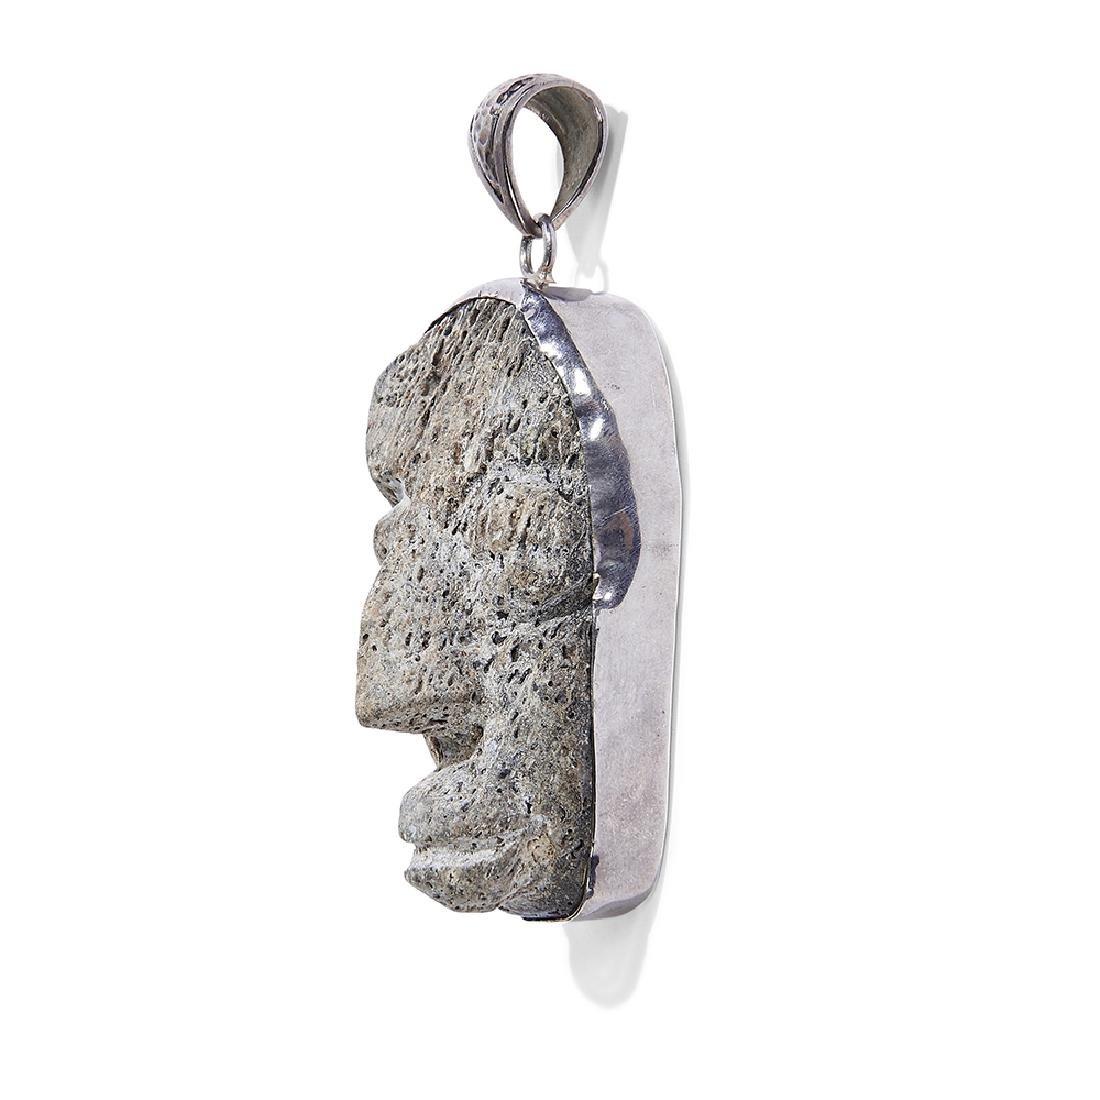 Modern / Pre-Columbian artifact pendant